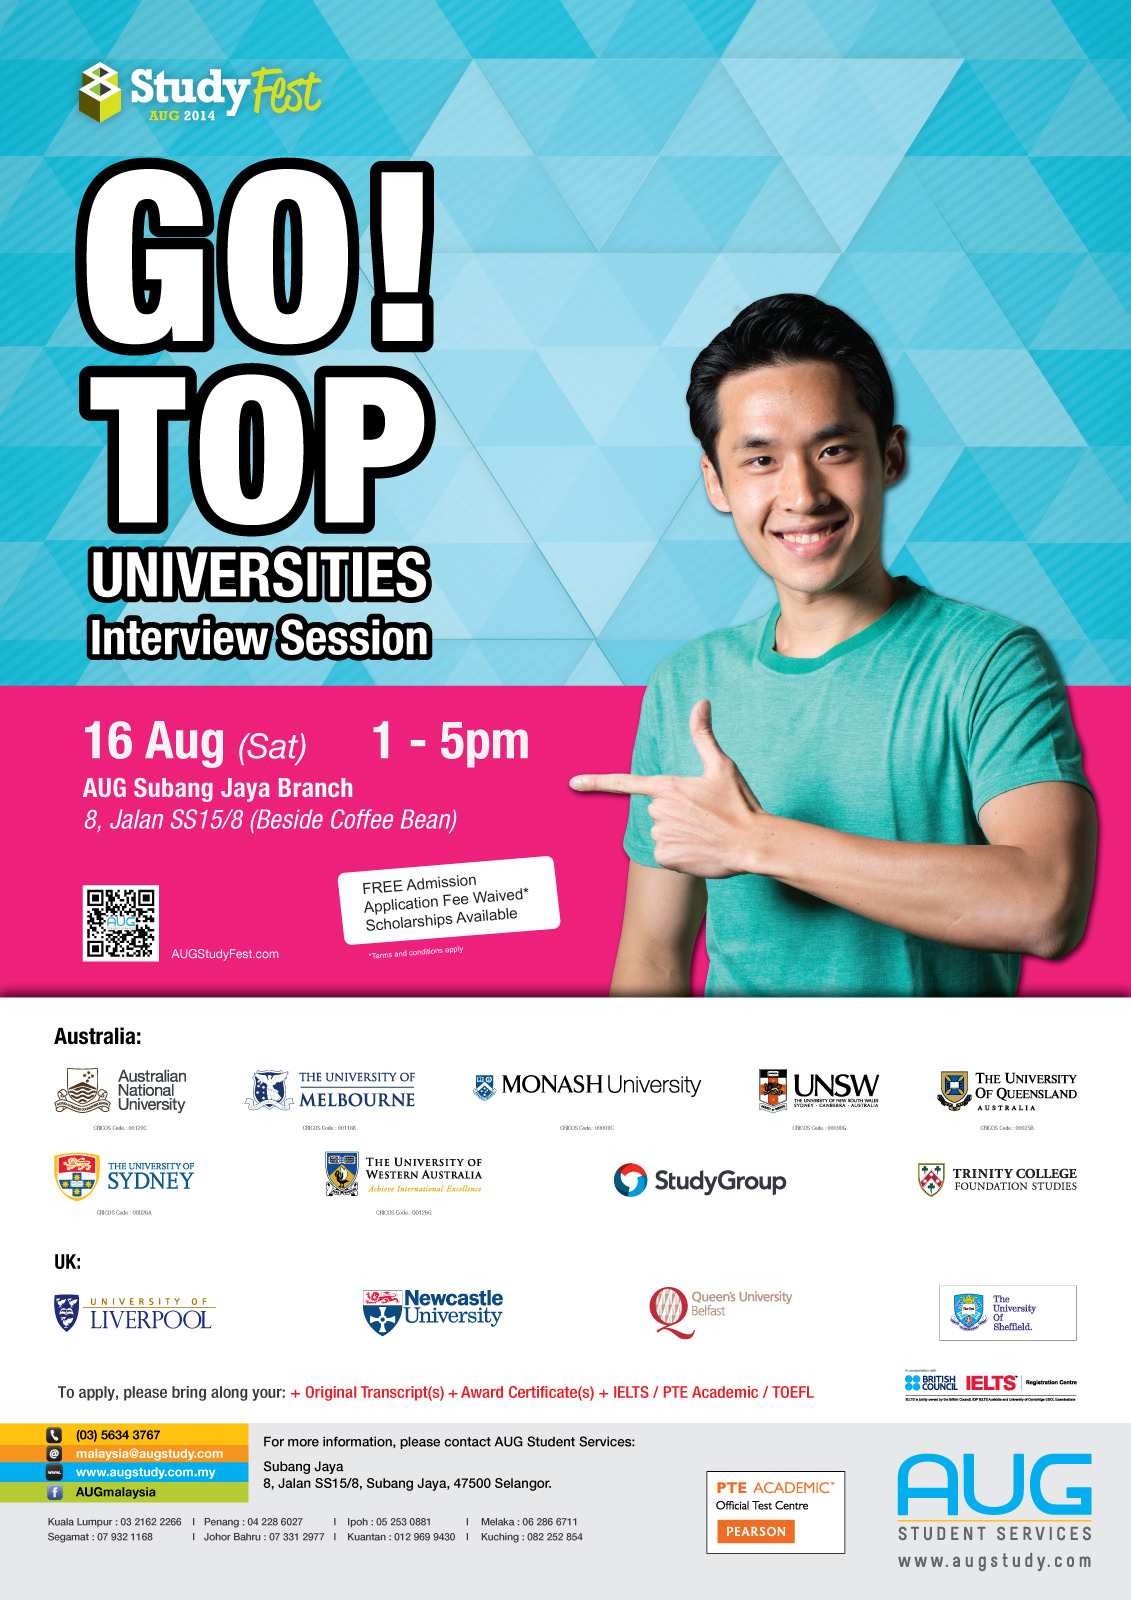 StudyFest 2014 Poster